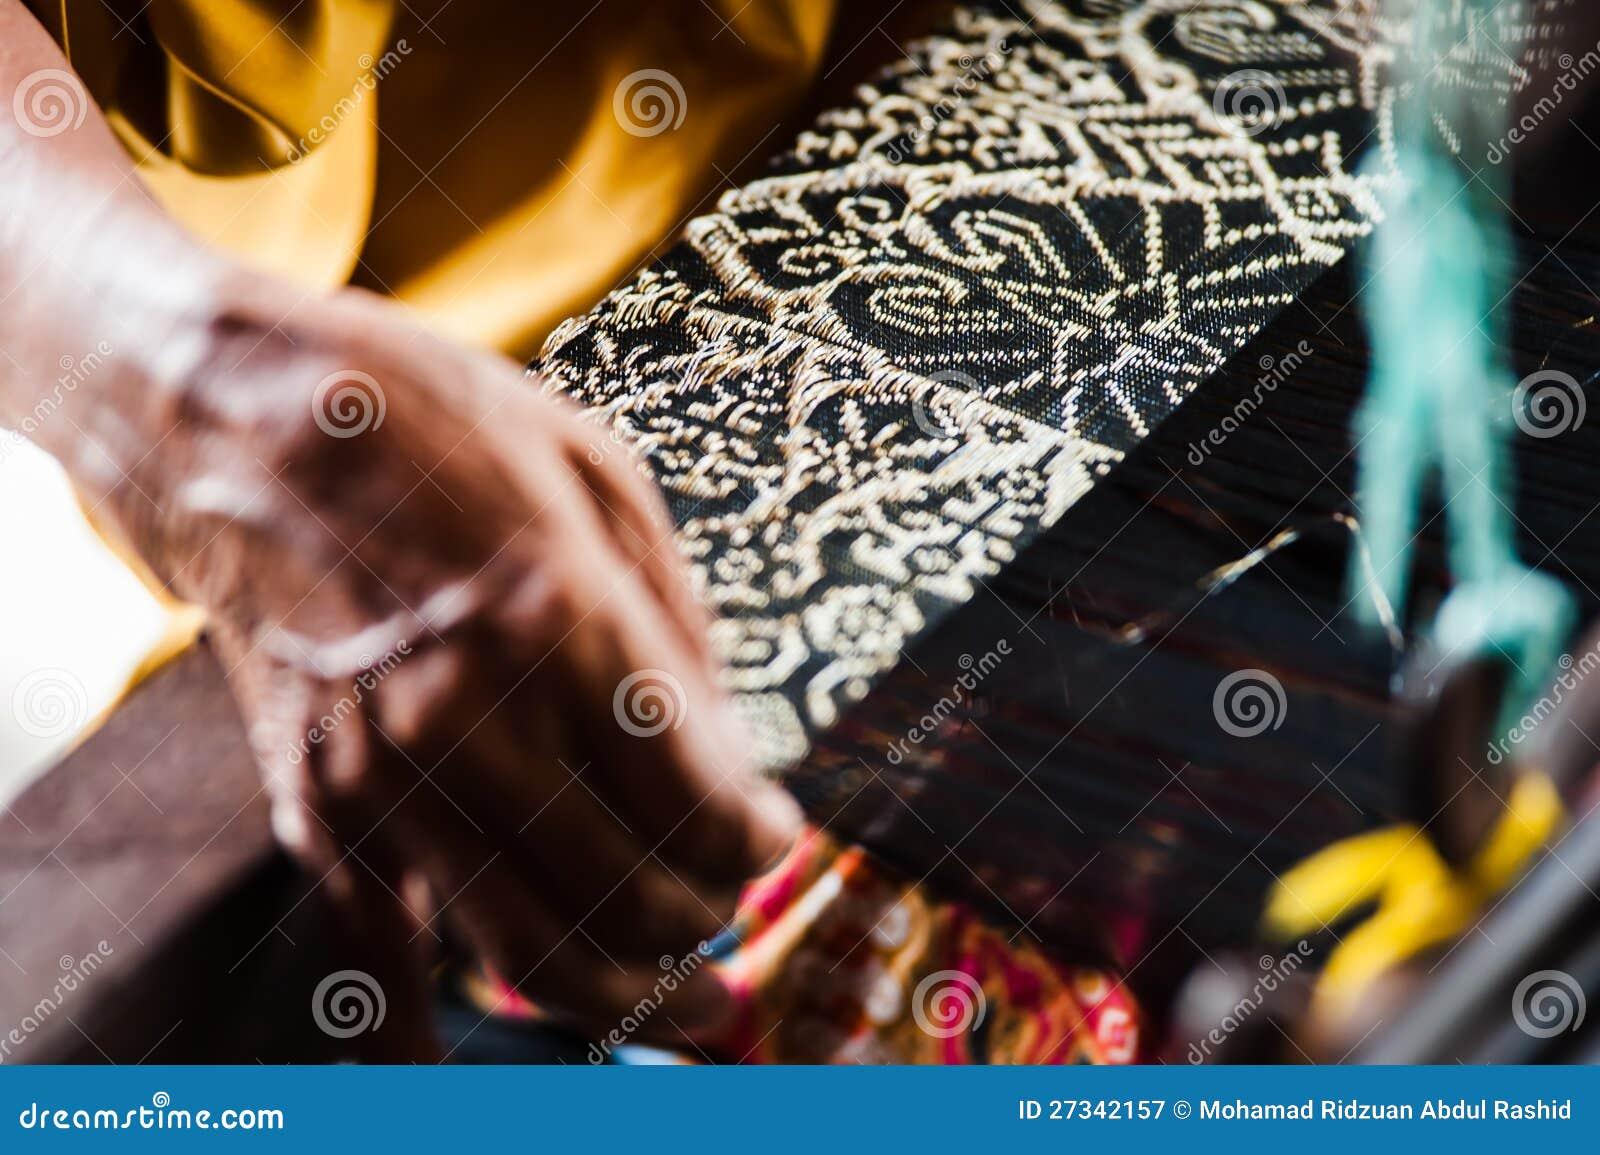 Batik design royalty free stock photos image 29546988 - Songket Weaving Royalty Free Stock Photography